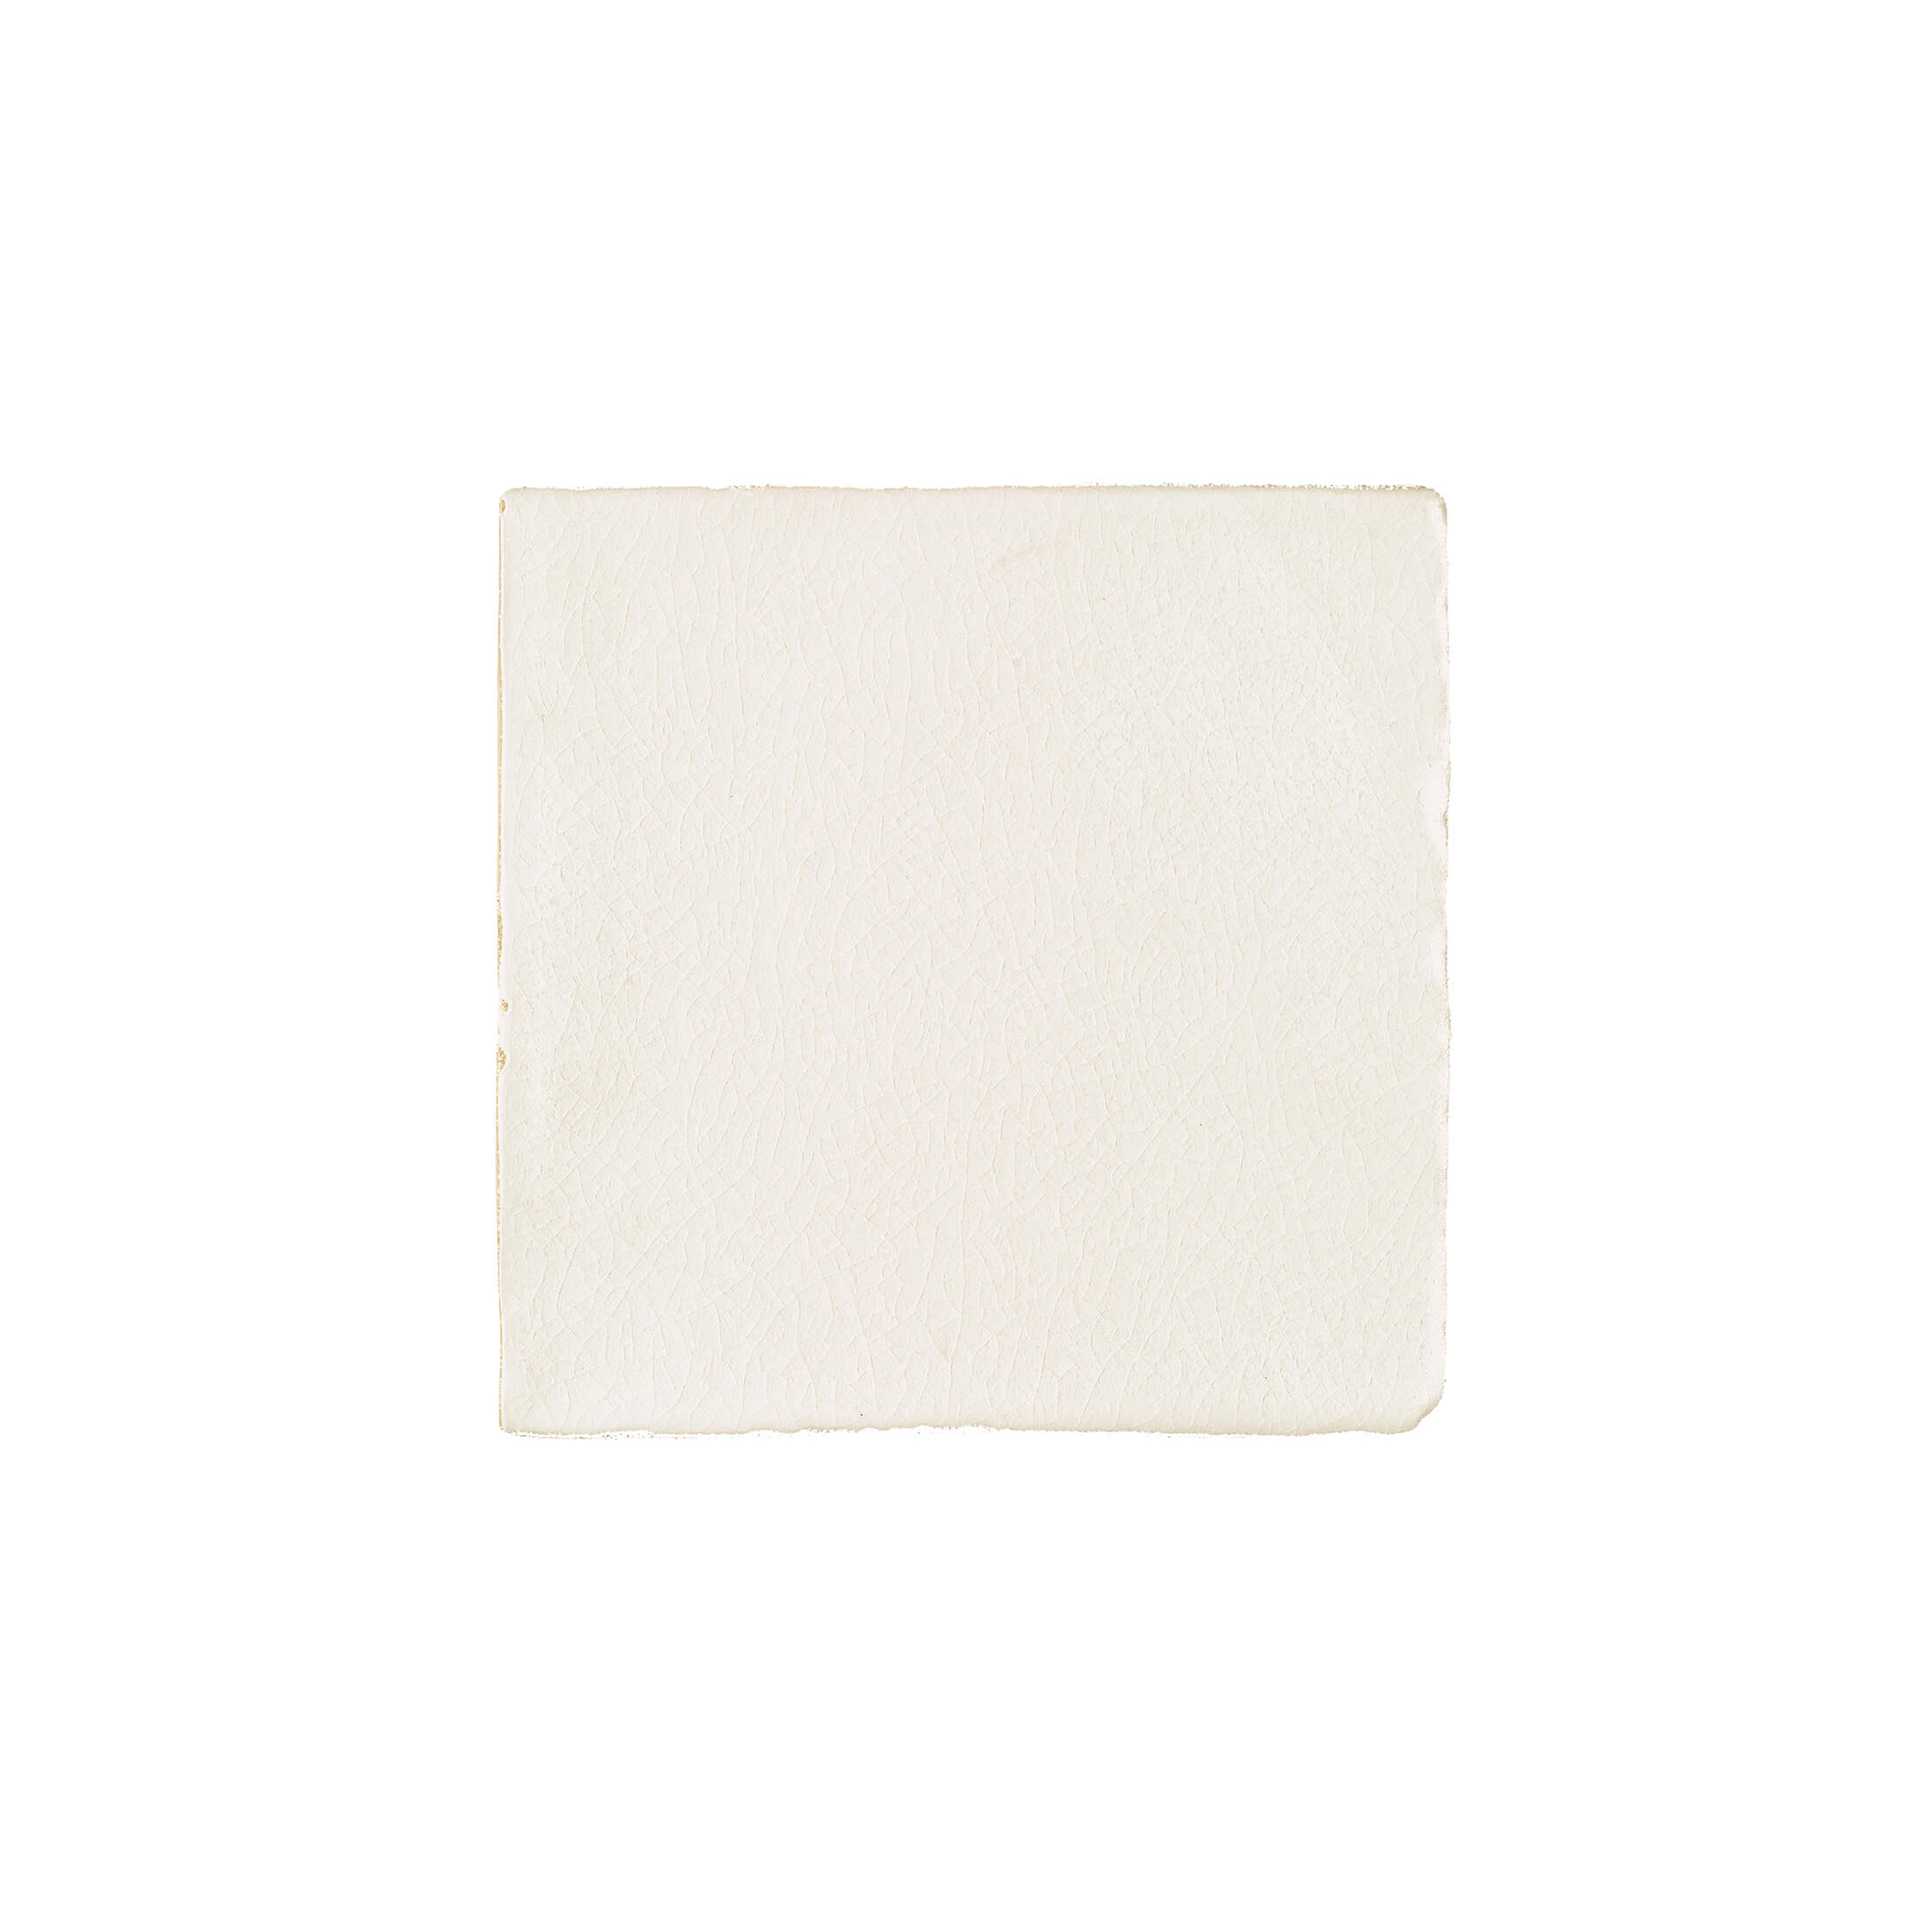 ADNT1011 - LISO  - 15 cm X 15 cm